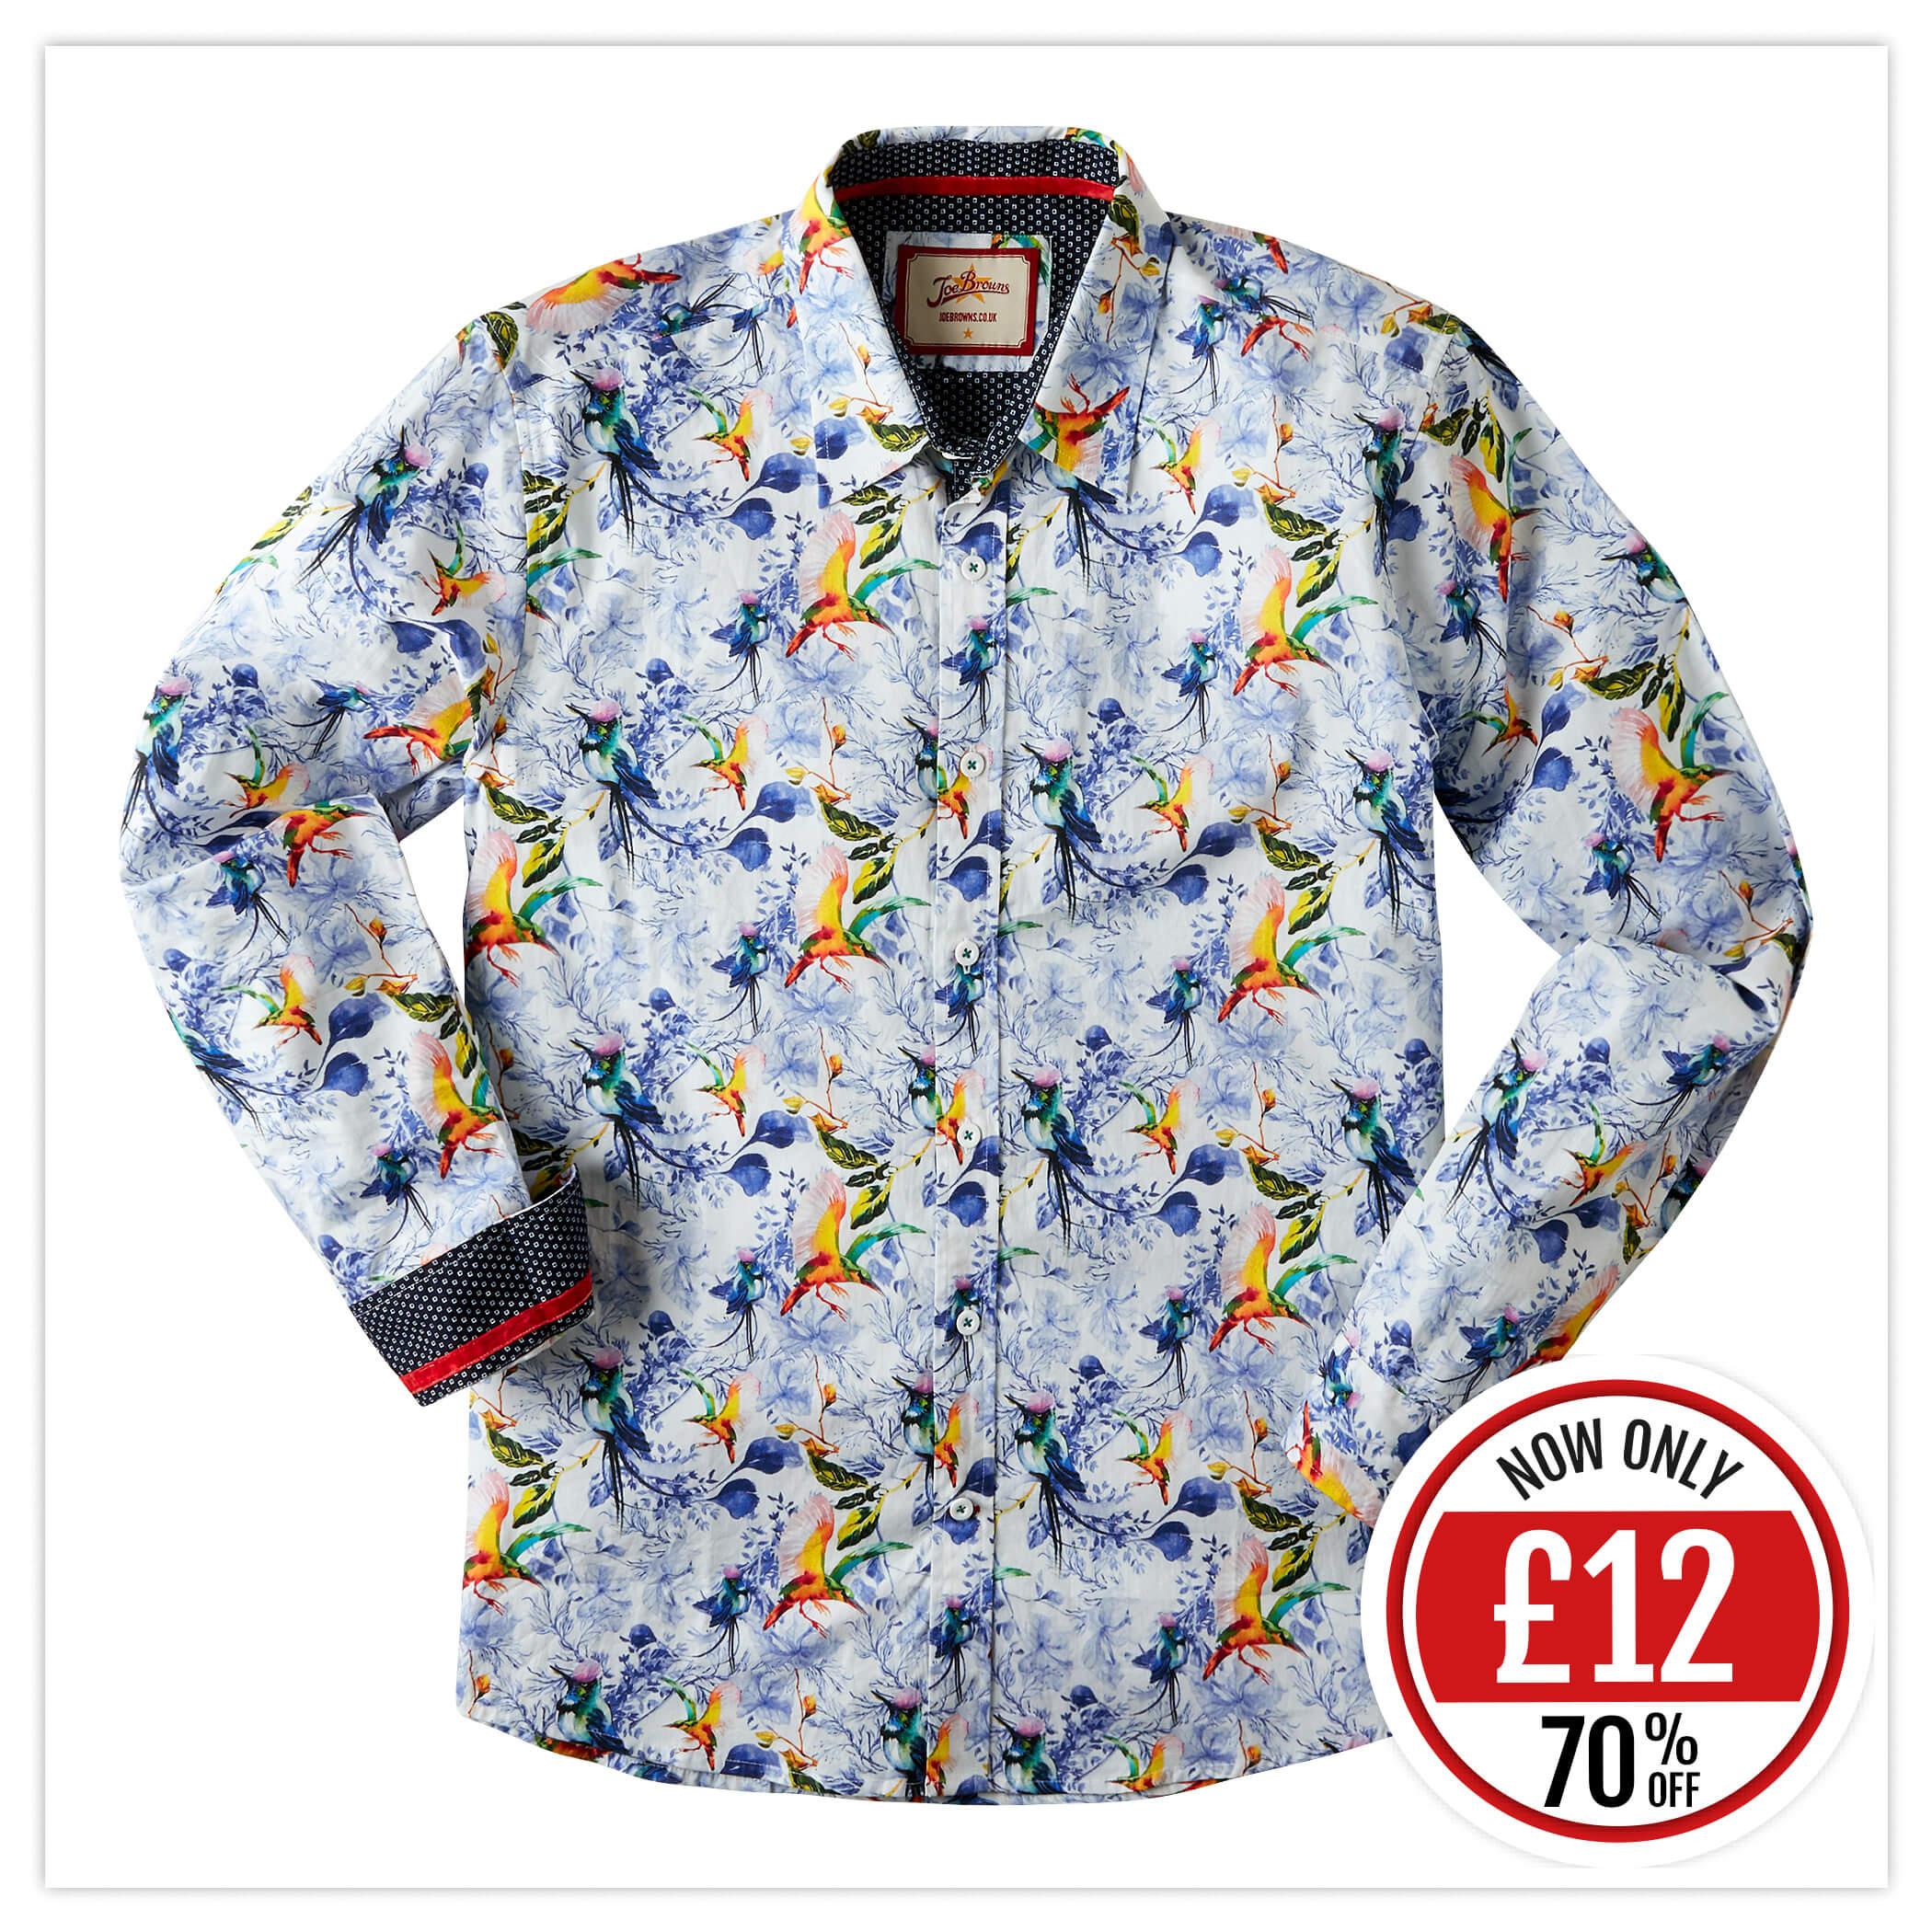 Fun Floral Shirt